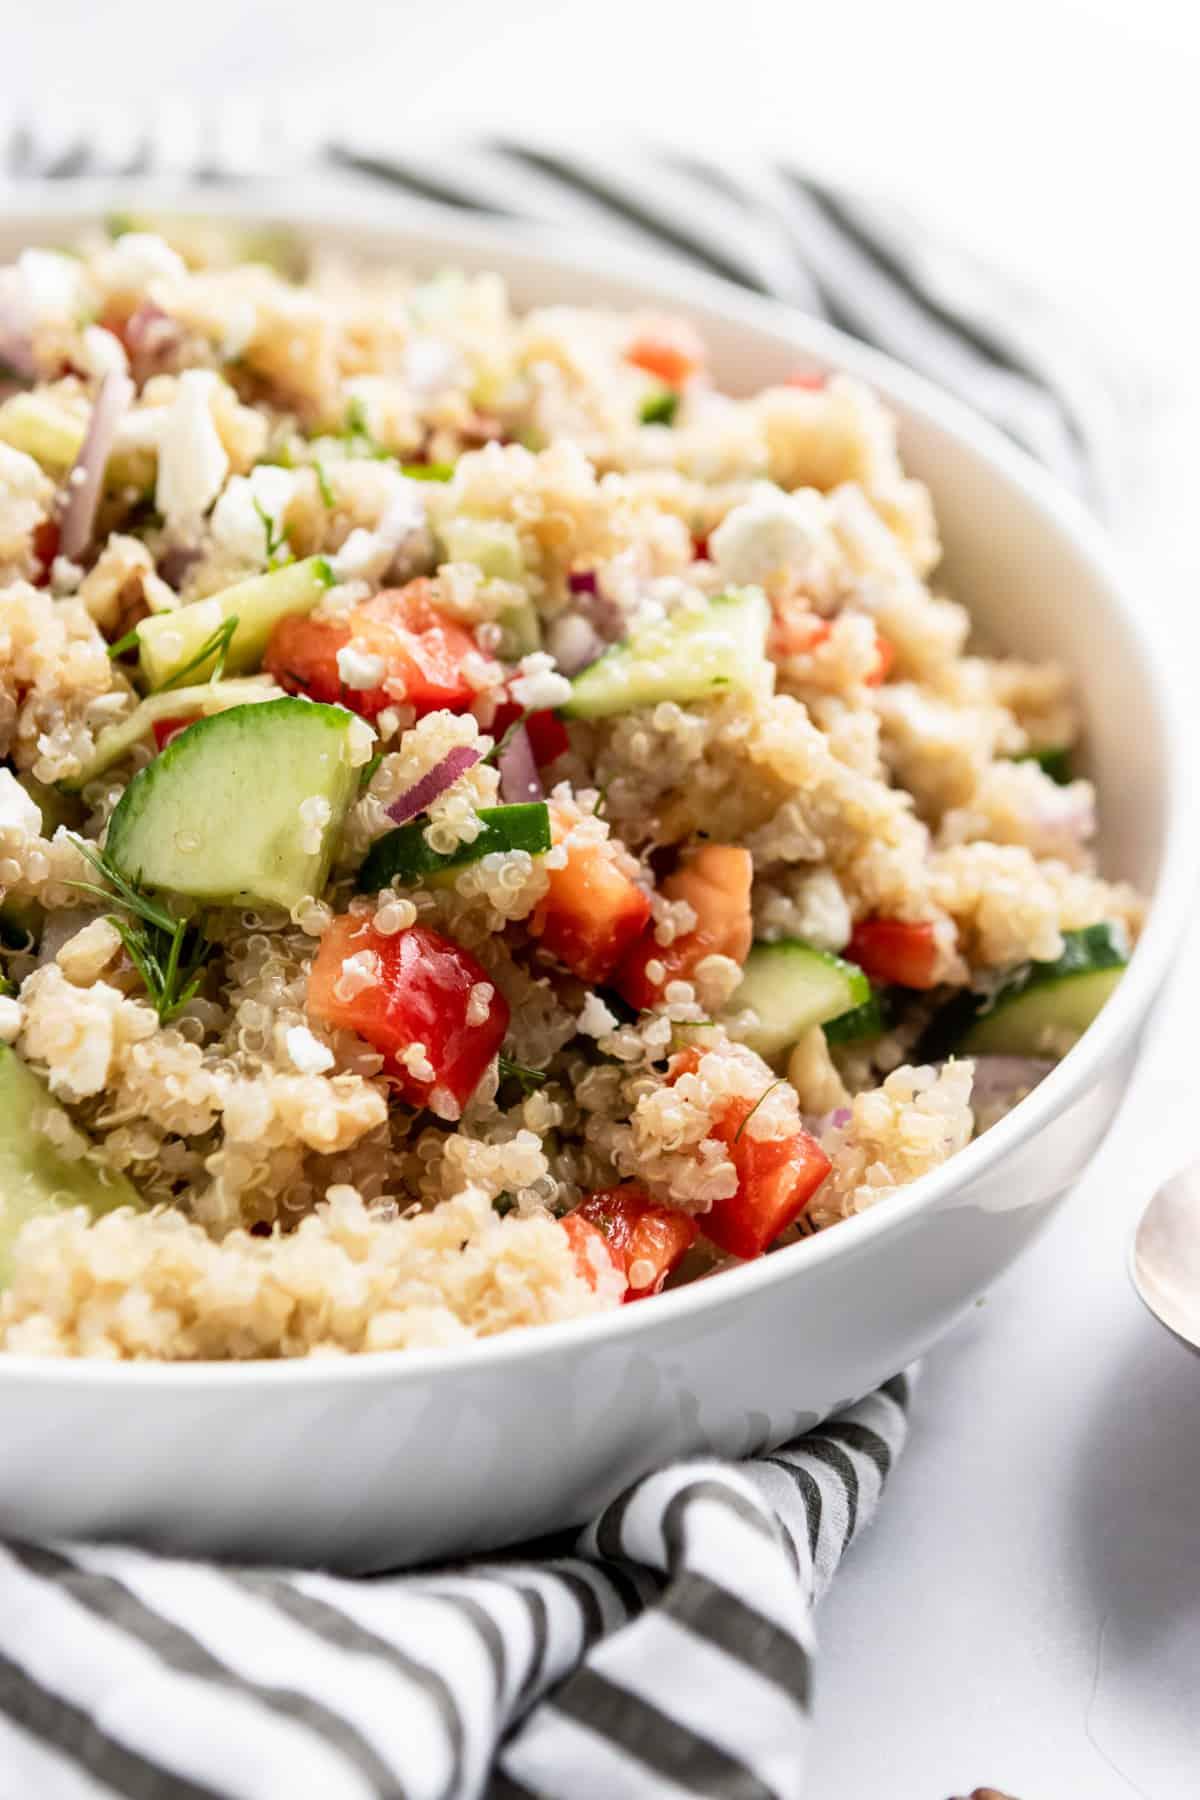 Bowl of salad with quinoa, cucumber, feta and pepper.